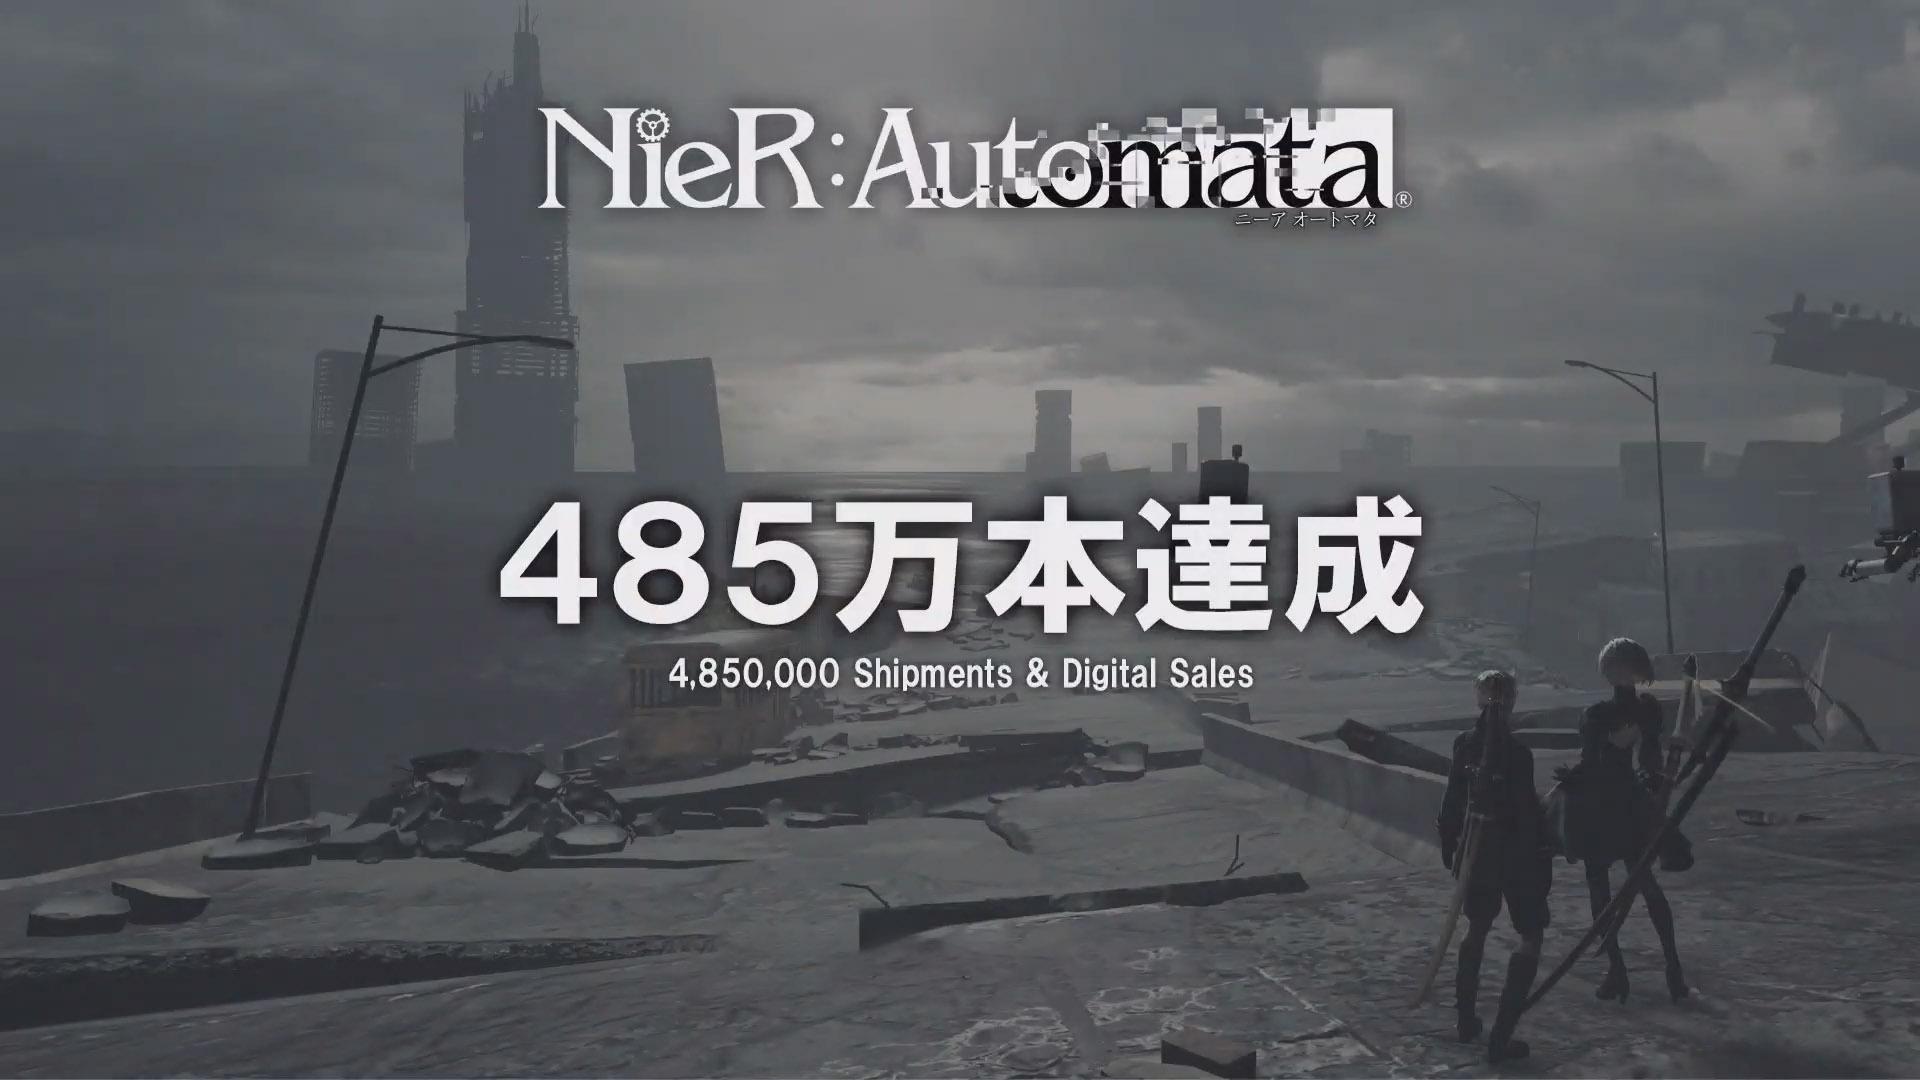 Skladba hry Scarlet Nexus a novinky ze série Yakuza a NieR NieR Automata Shipments 09 24 20